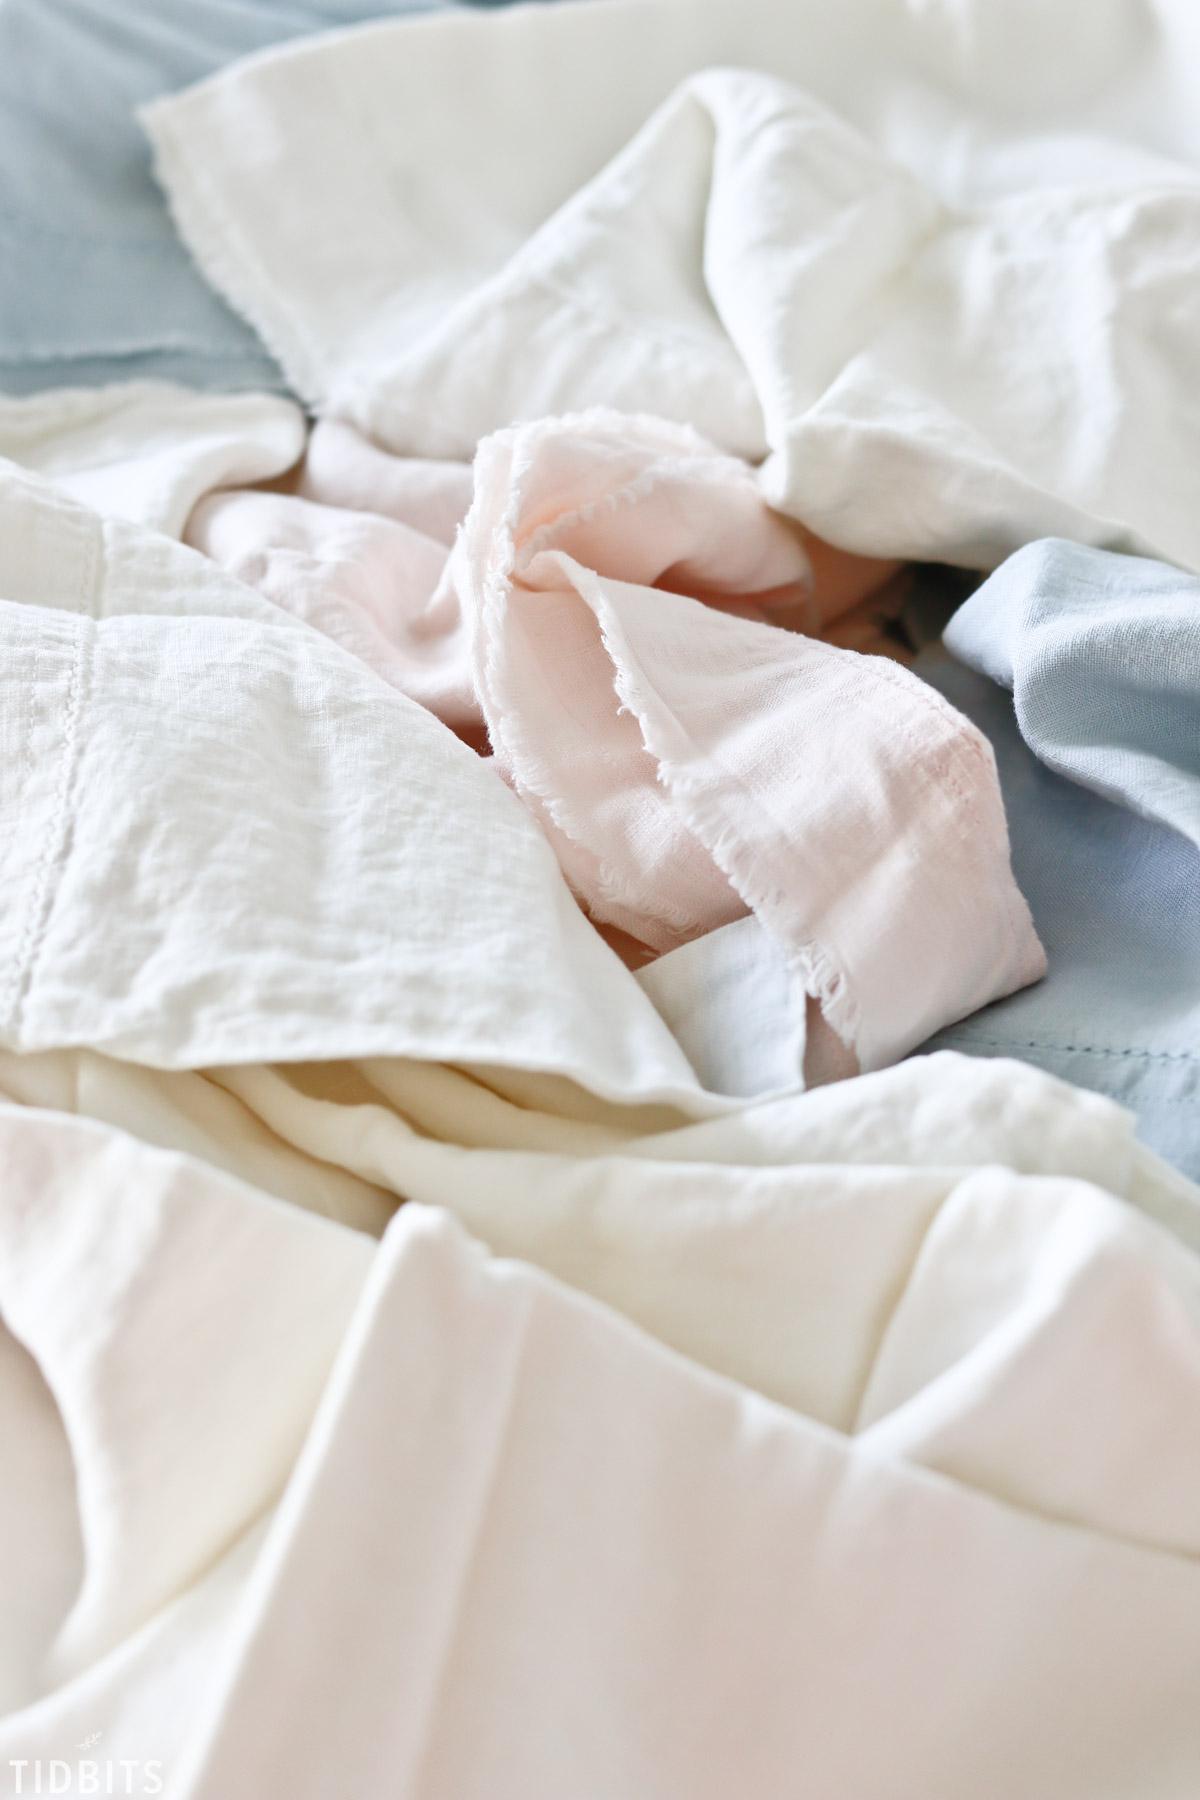 texture of linen